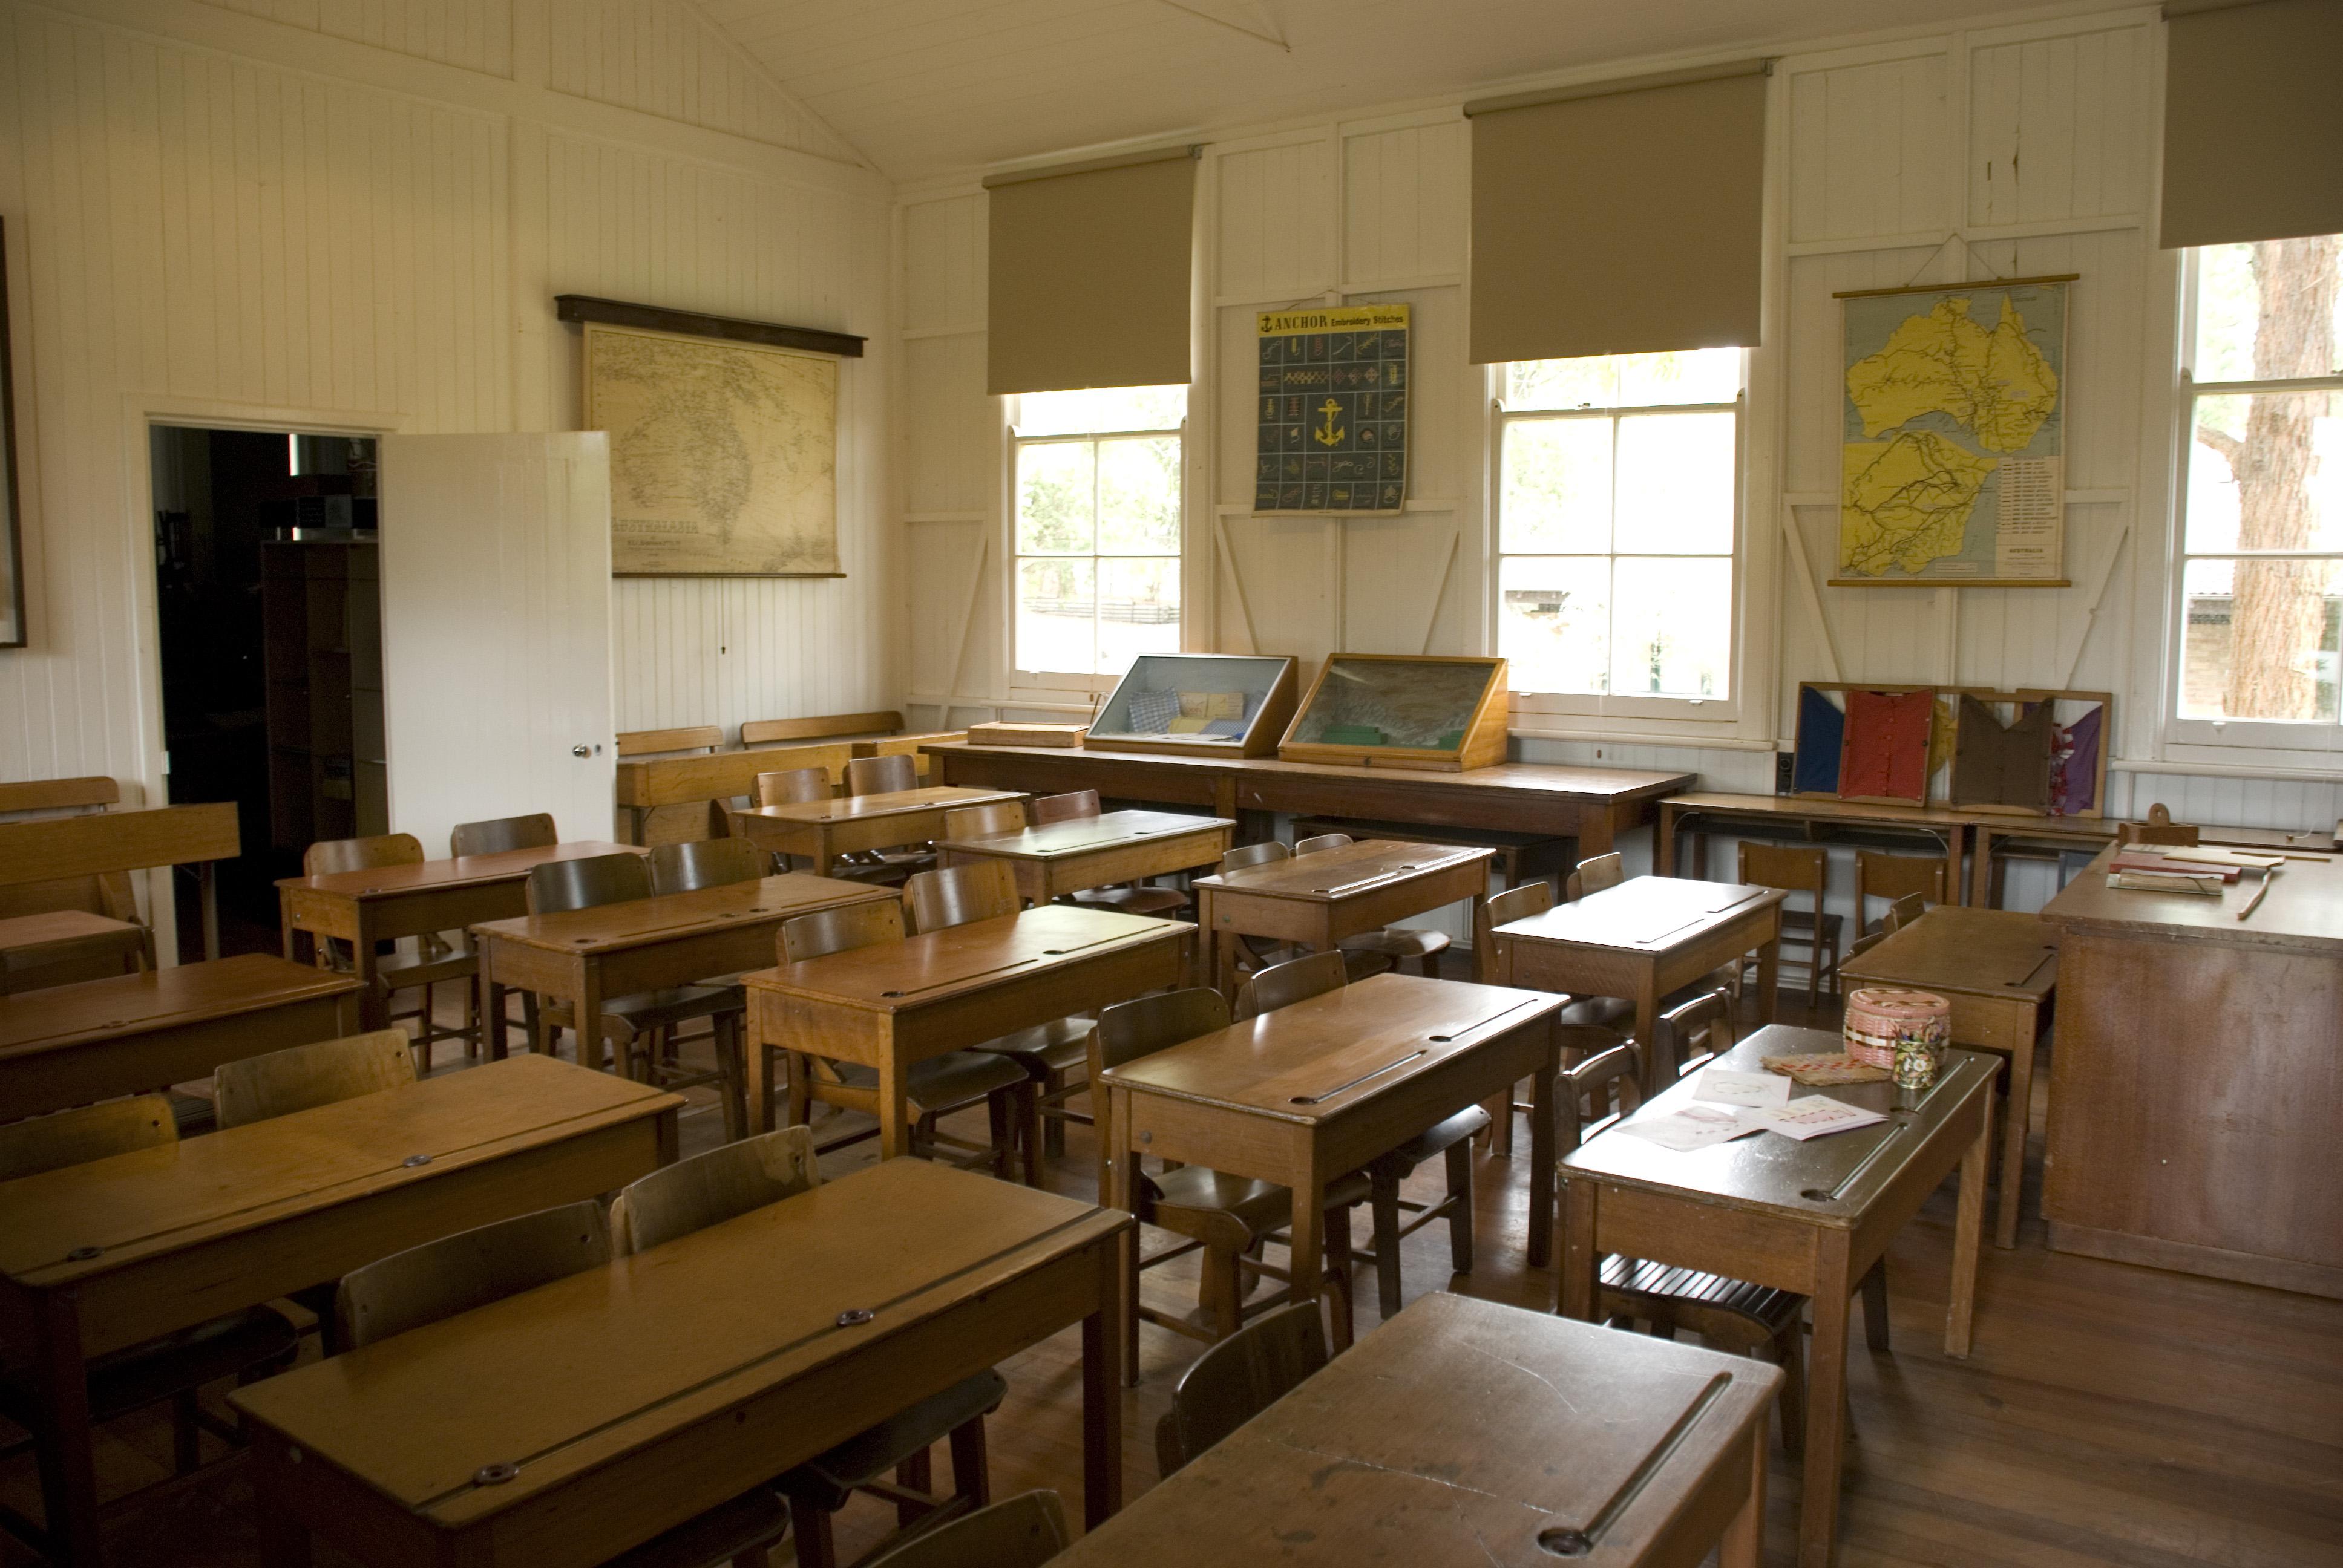 Location Hire Schoolhouse Museum